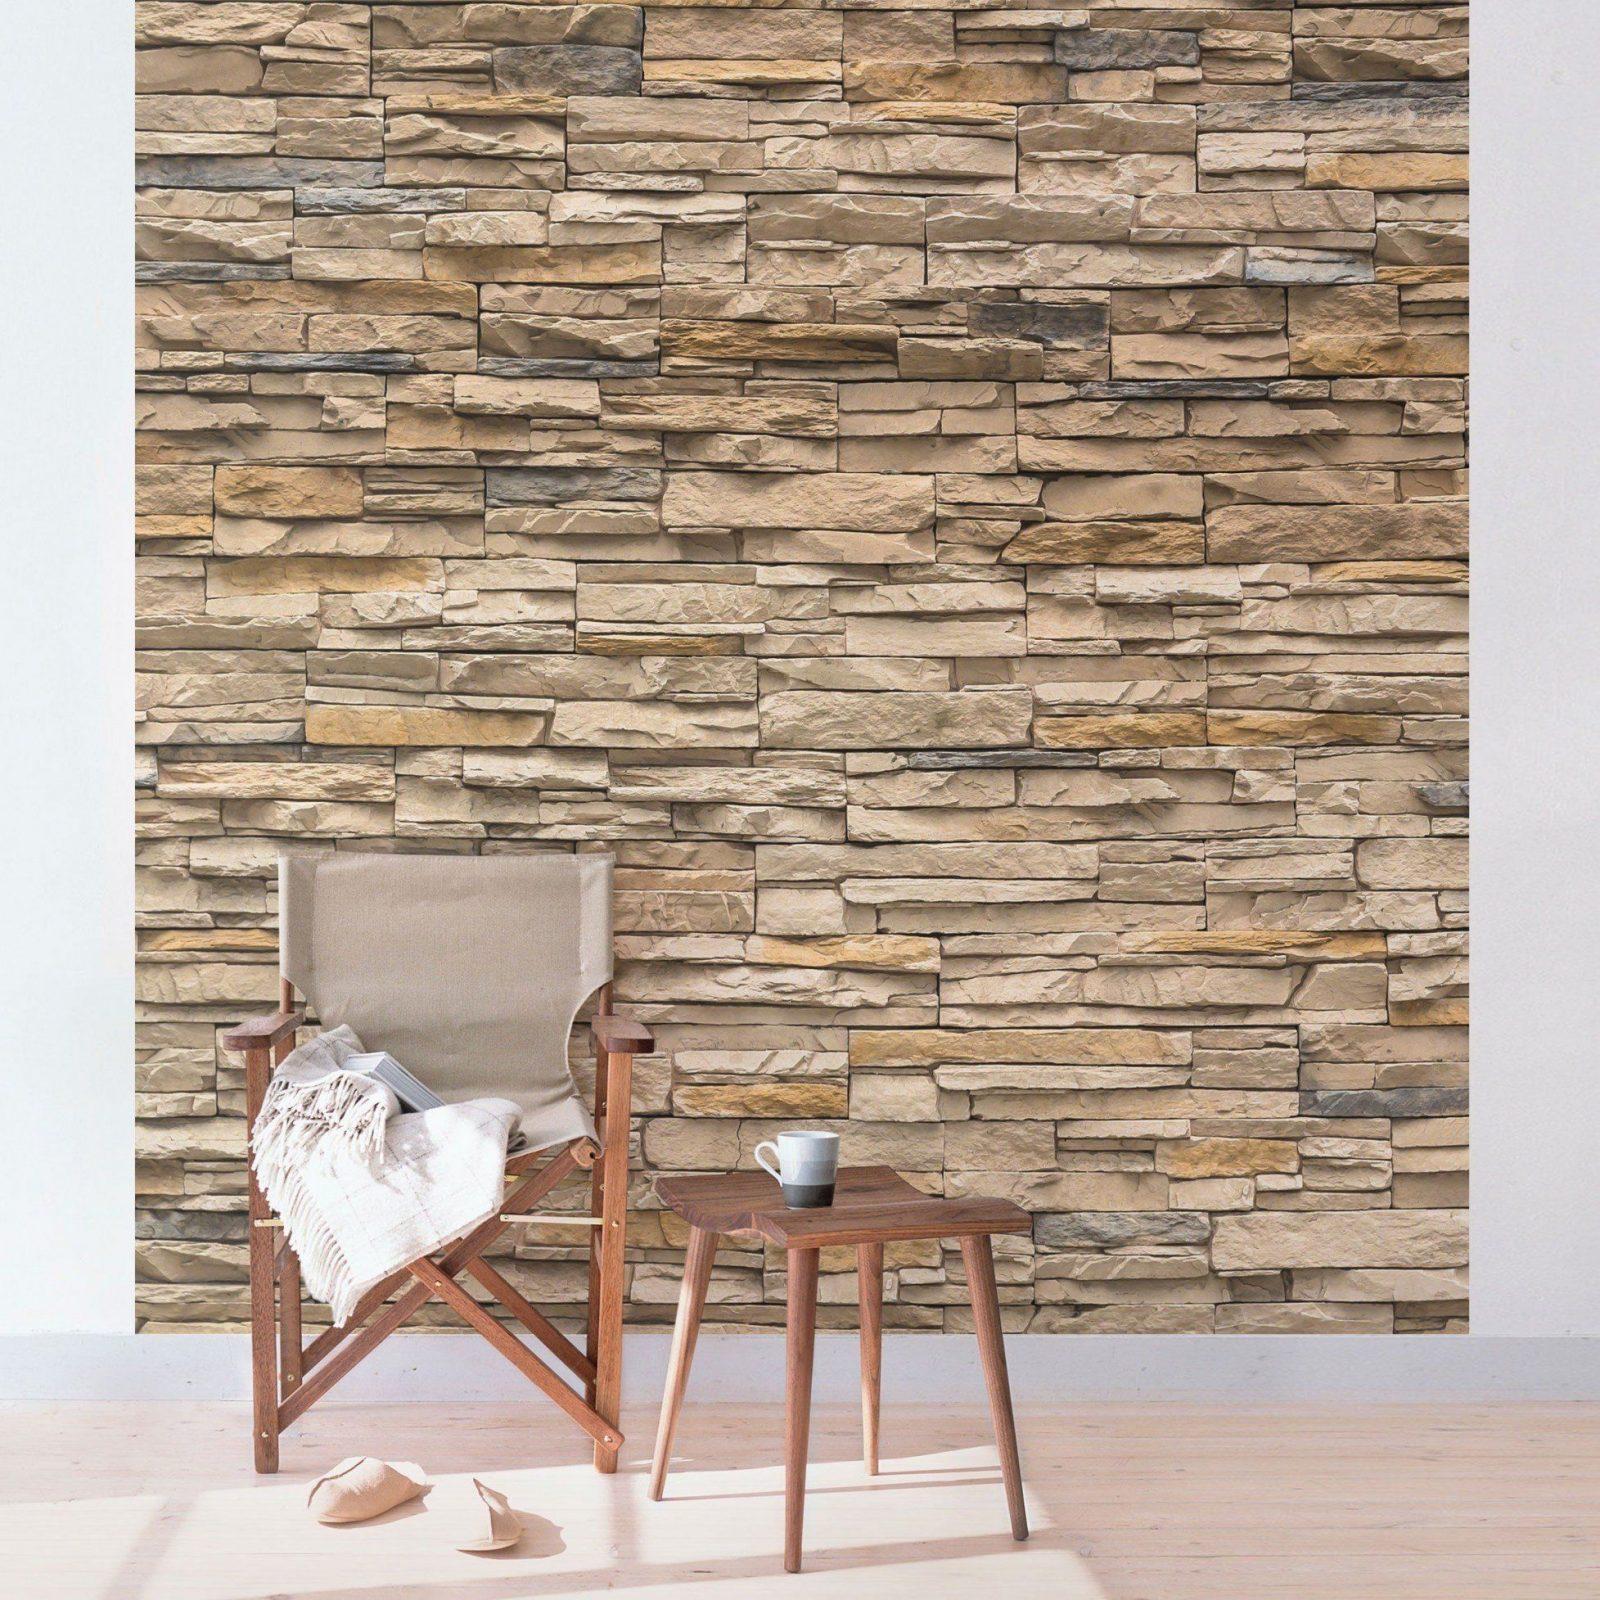 Fototapete  Steintapete Andalusia Stonewall  Vliestapete Quadrat von Tapete Mauer Optik 3D Bild